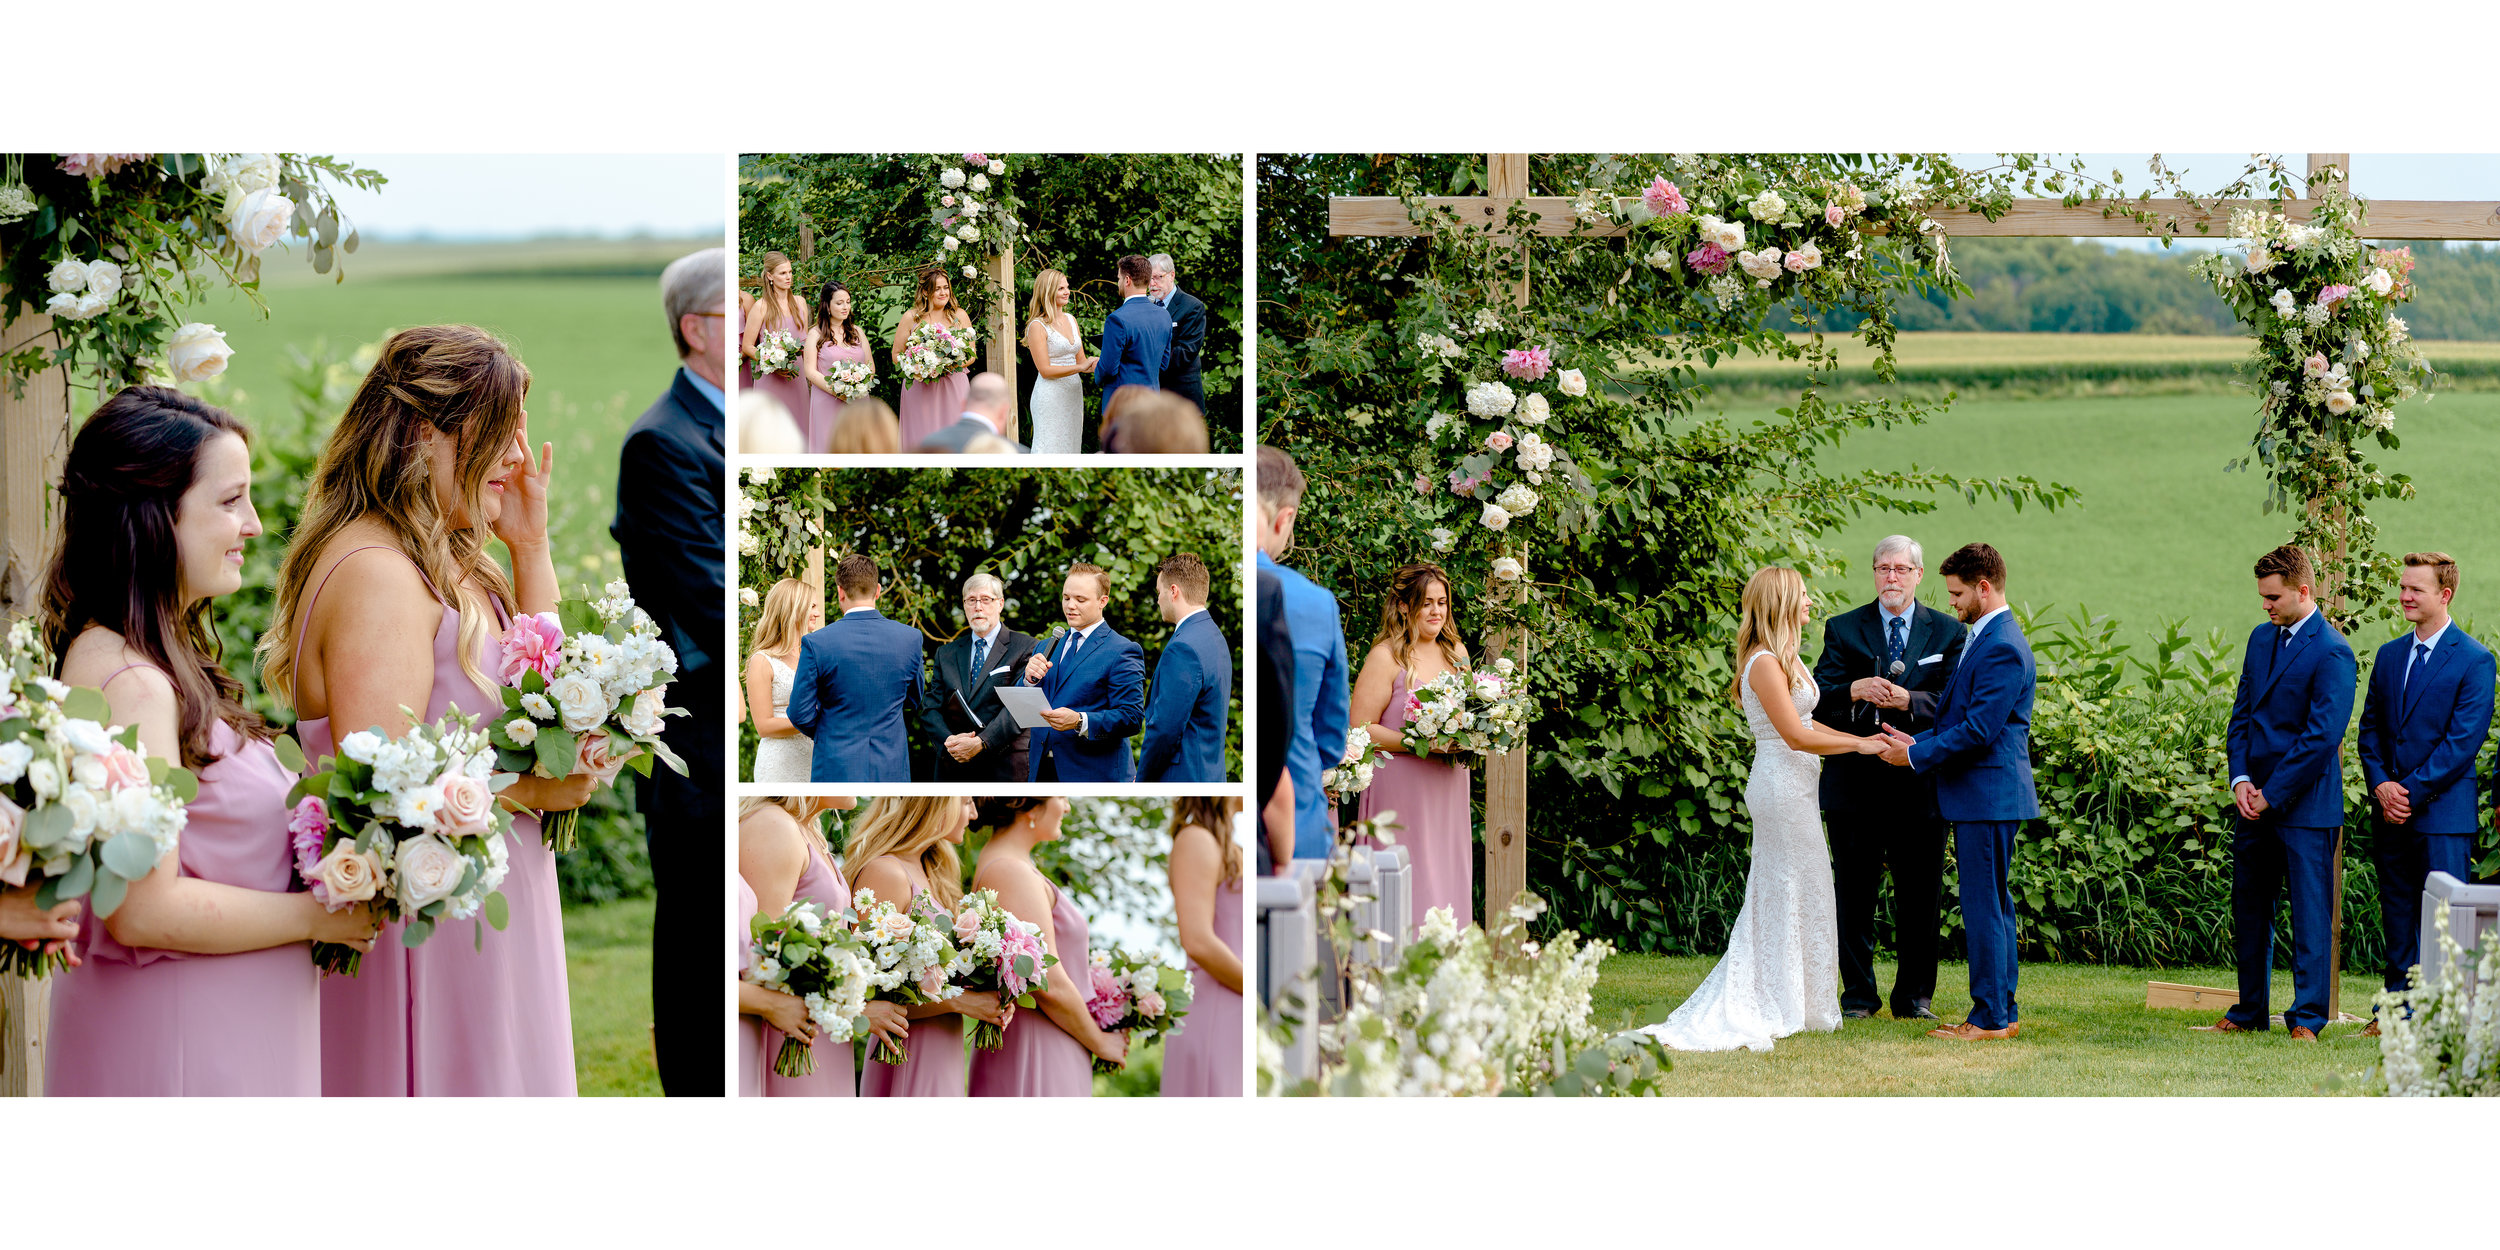 Ashley + Justin - Wedding Album_22.jpg